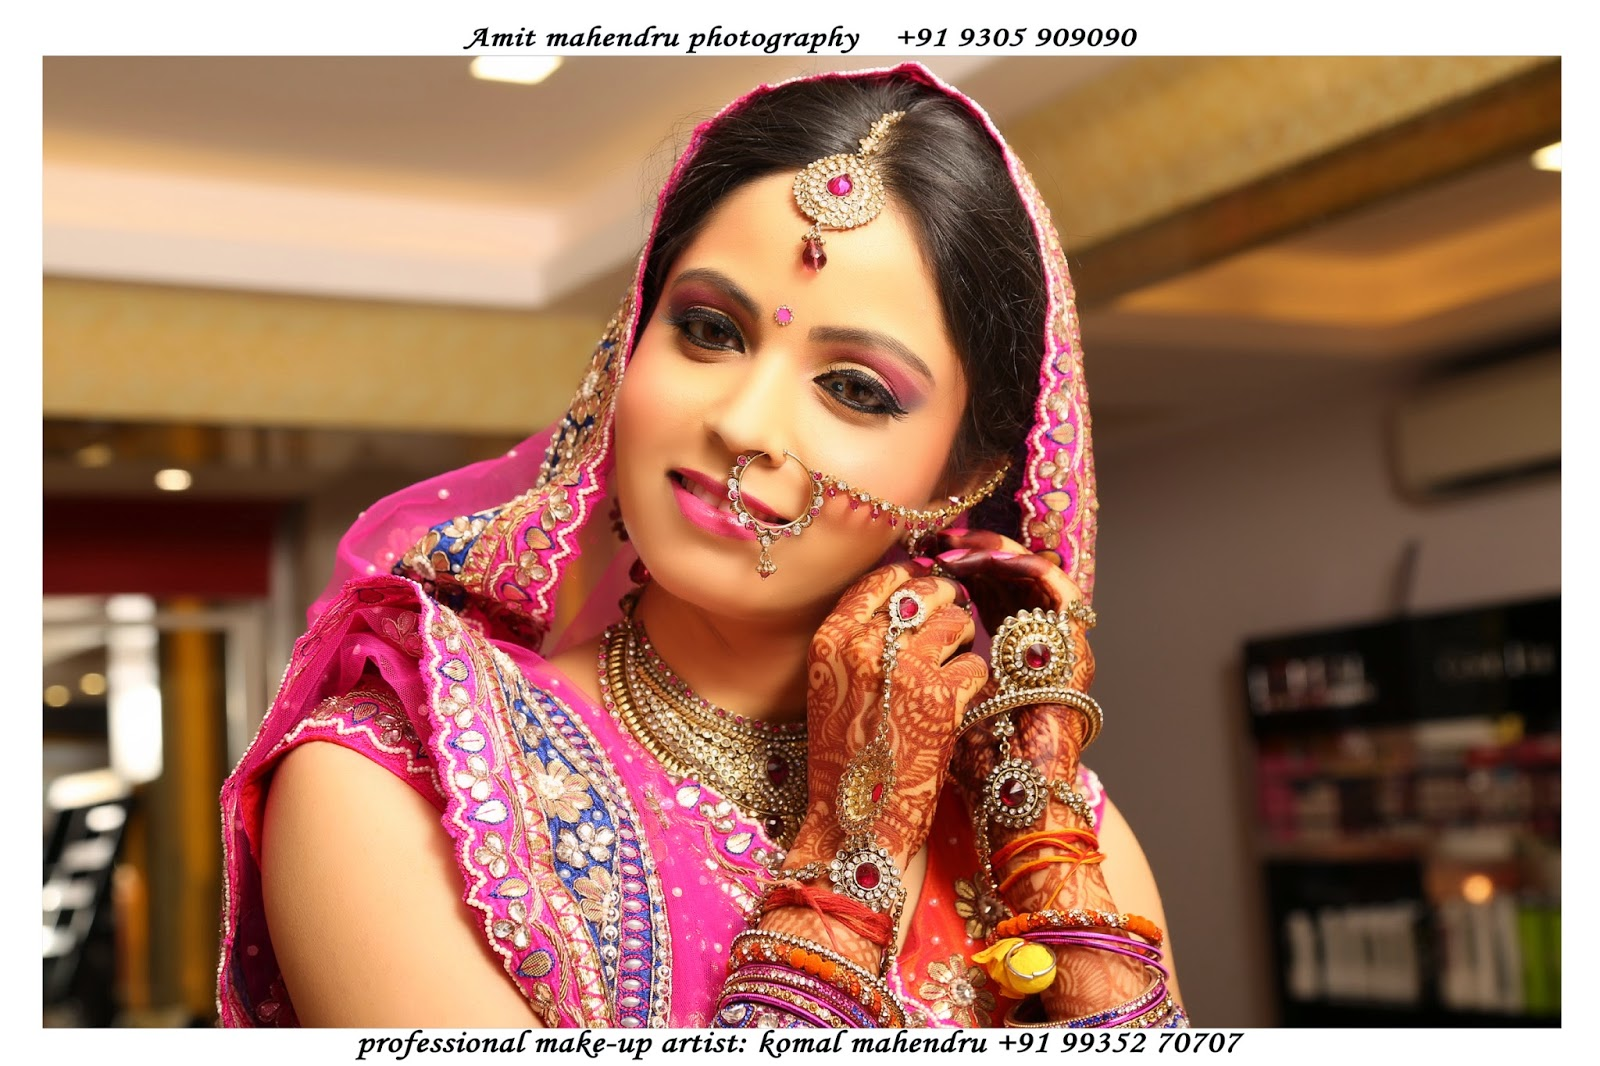 Komal mahendru s professional makeup lucknow india bridal makeup - Bridal Makeup Artist In Lucknow